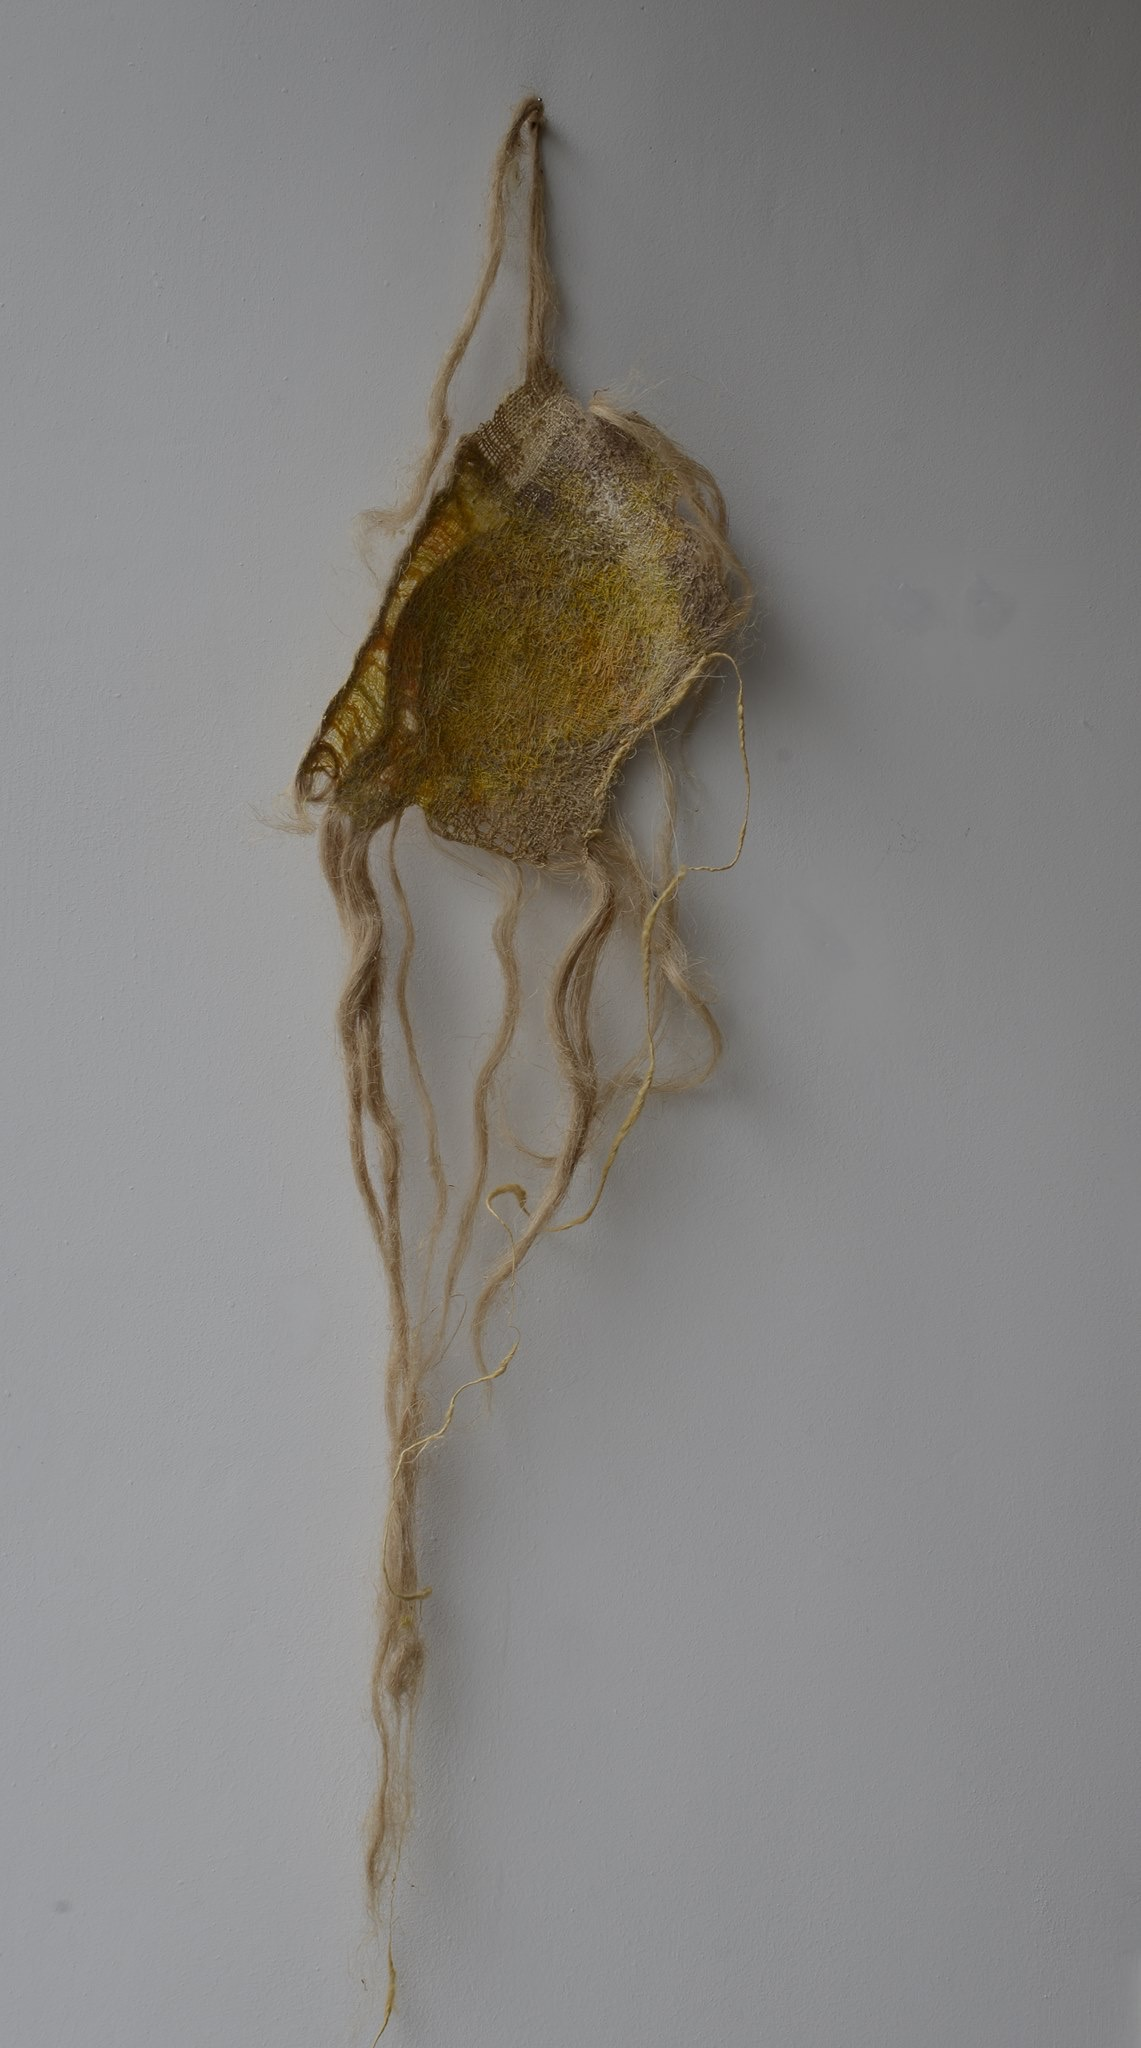 Veronique Cardinael